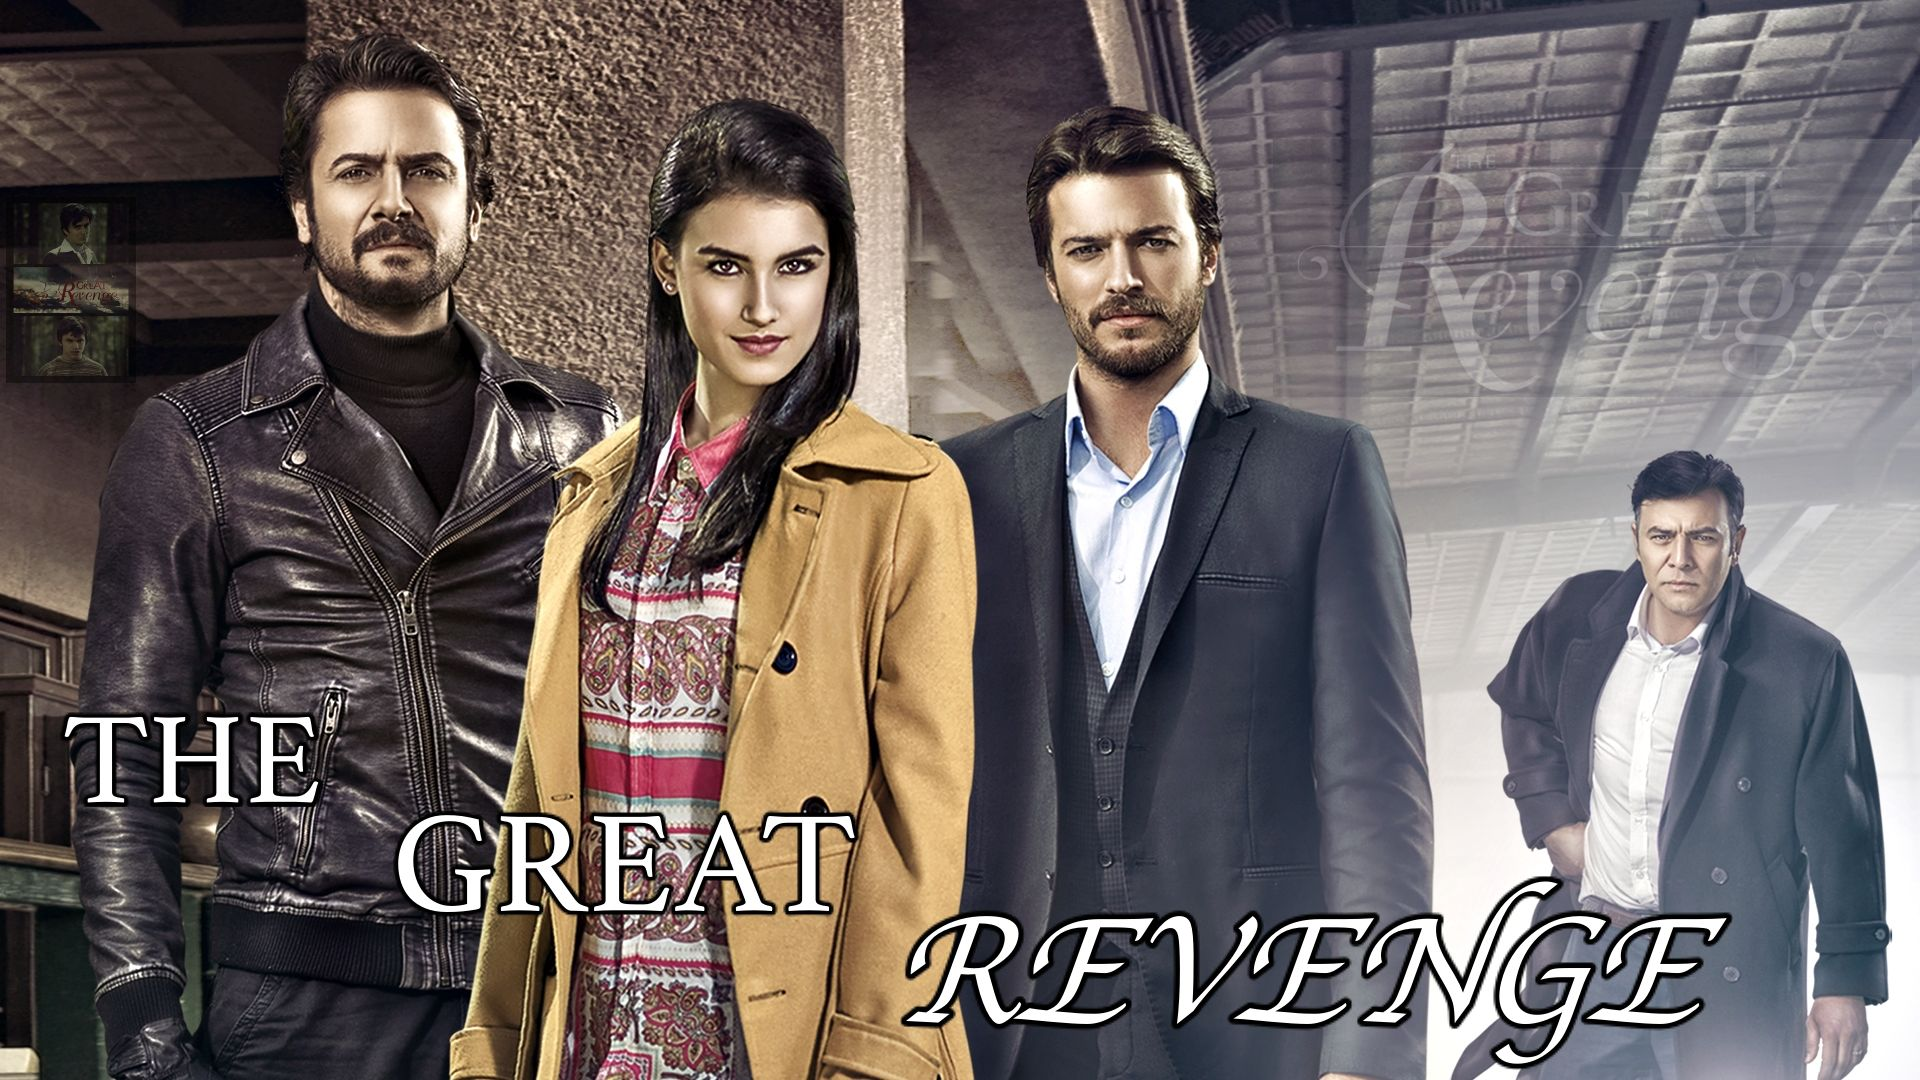 The Great Revenge Ep 1